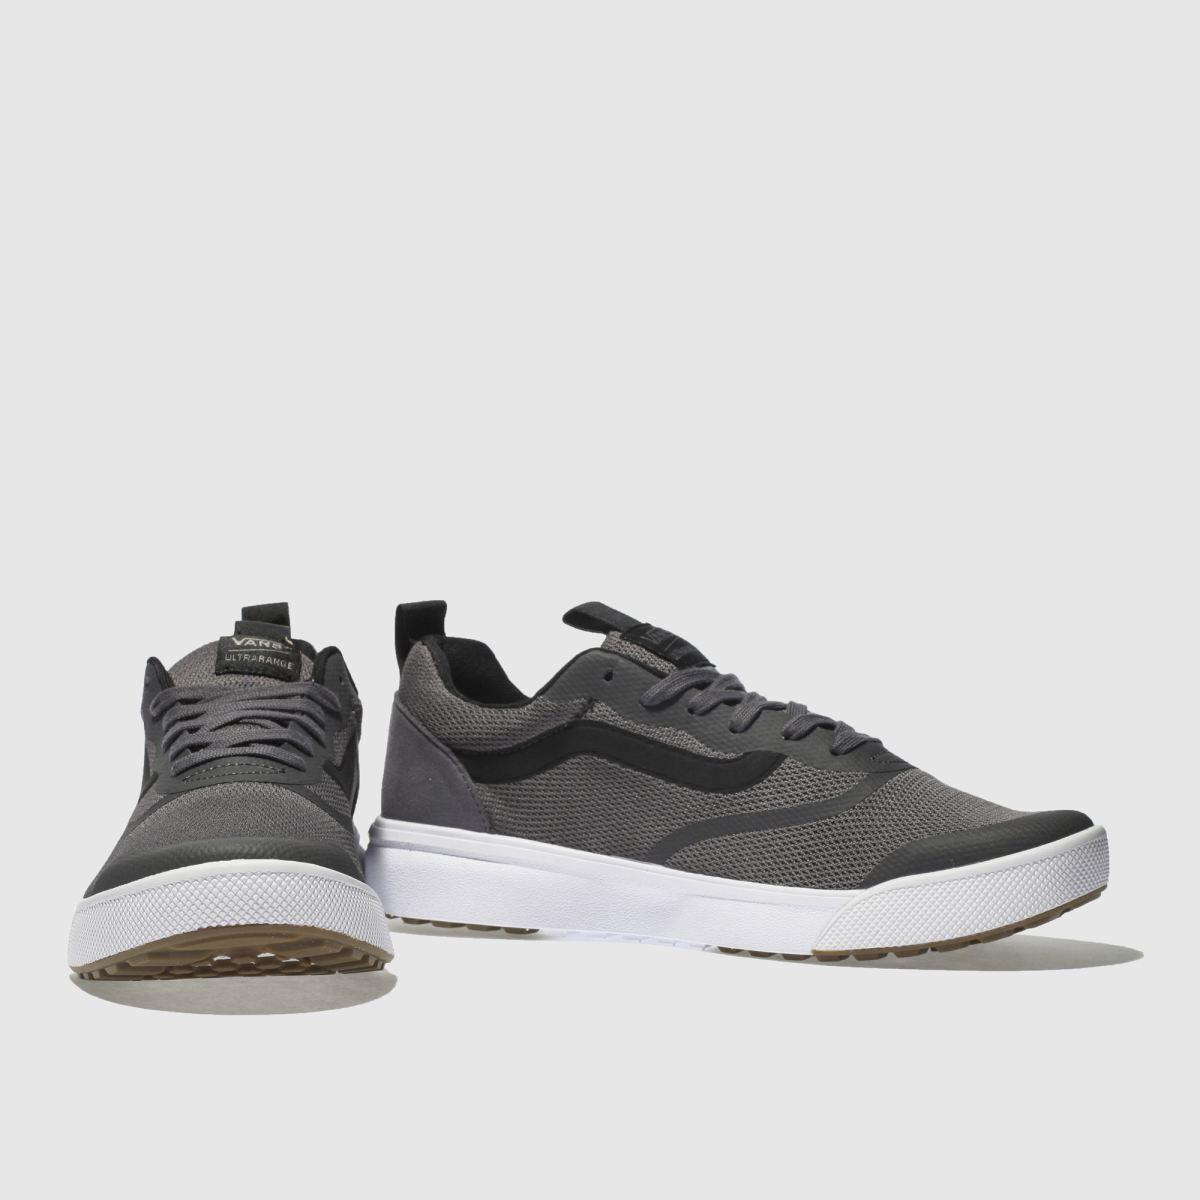 Herren Grau-schwarz vans Ultrarange Rapidweld Sneaker | schuh Gute Qualität beliebte Schuhe